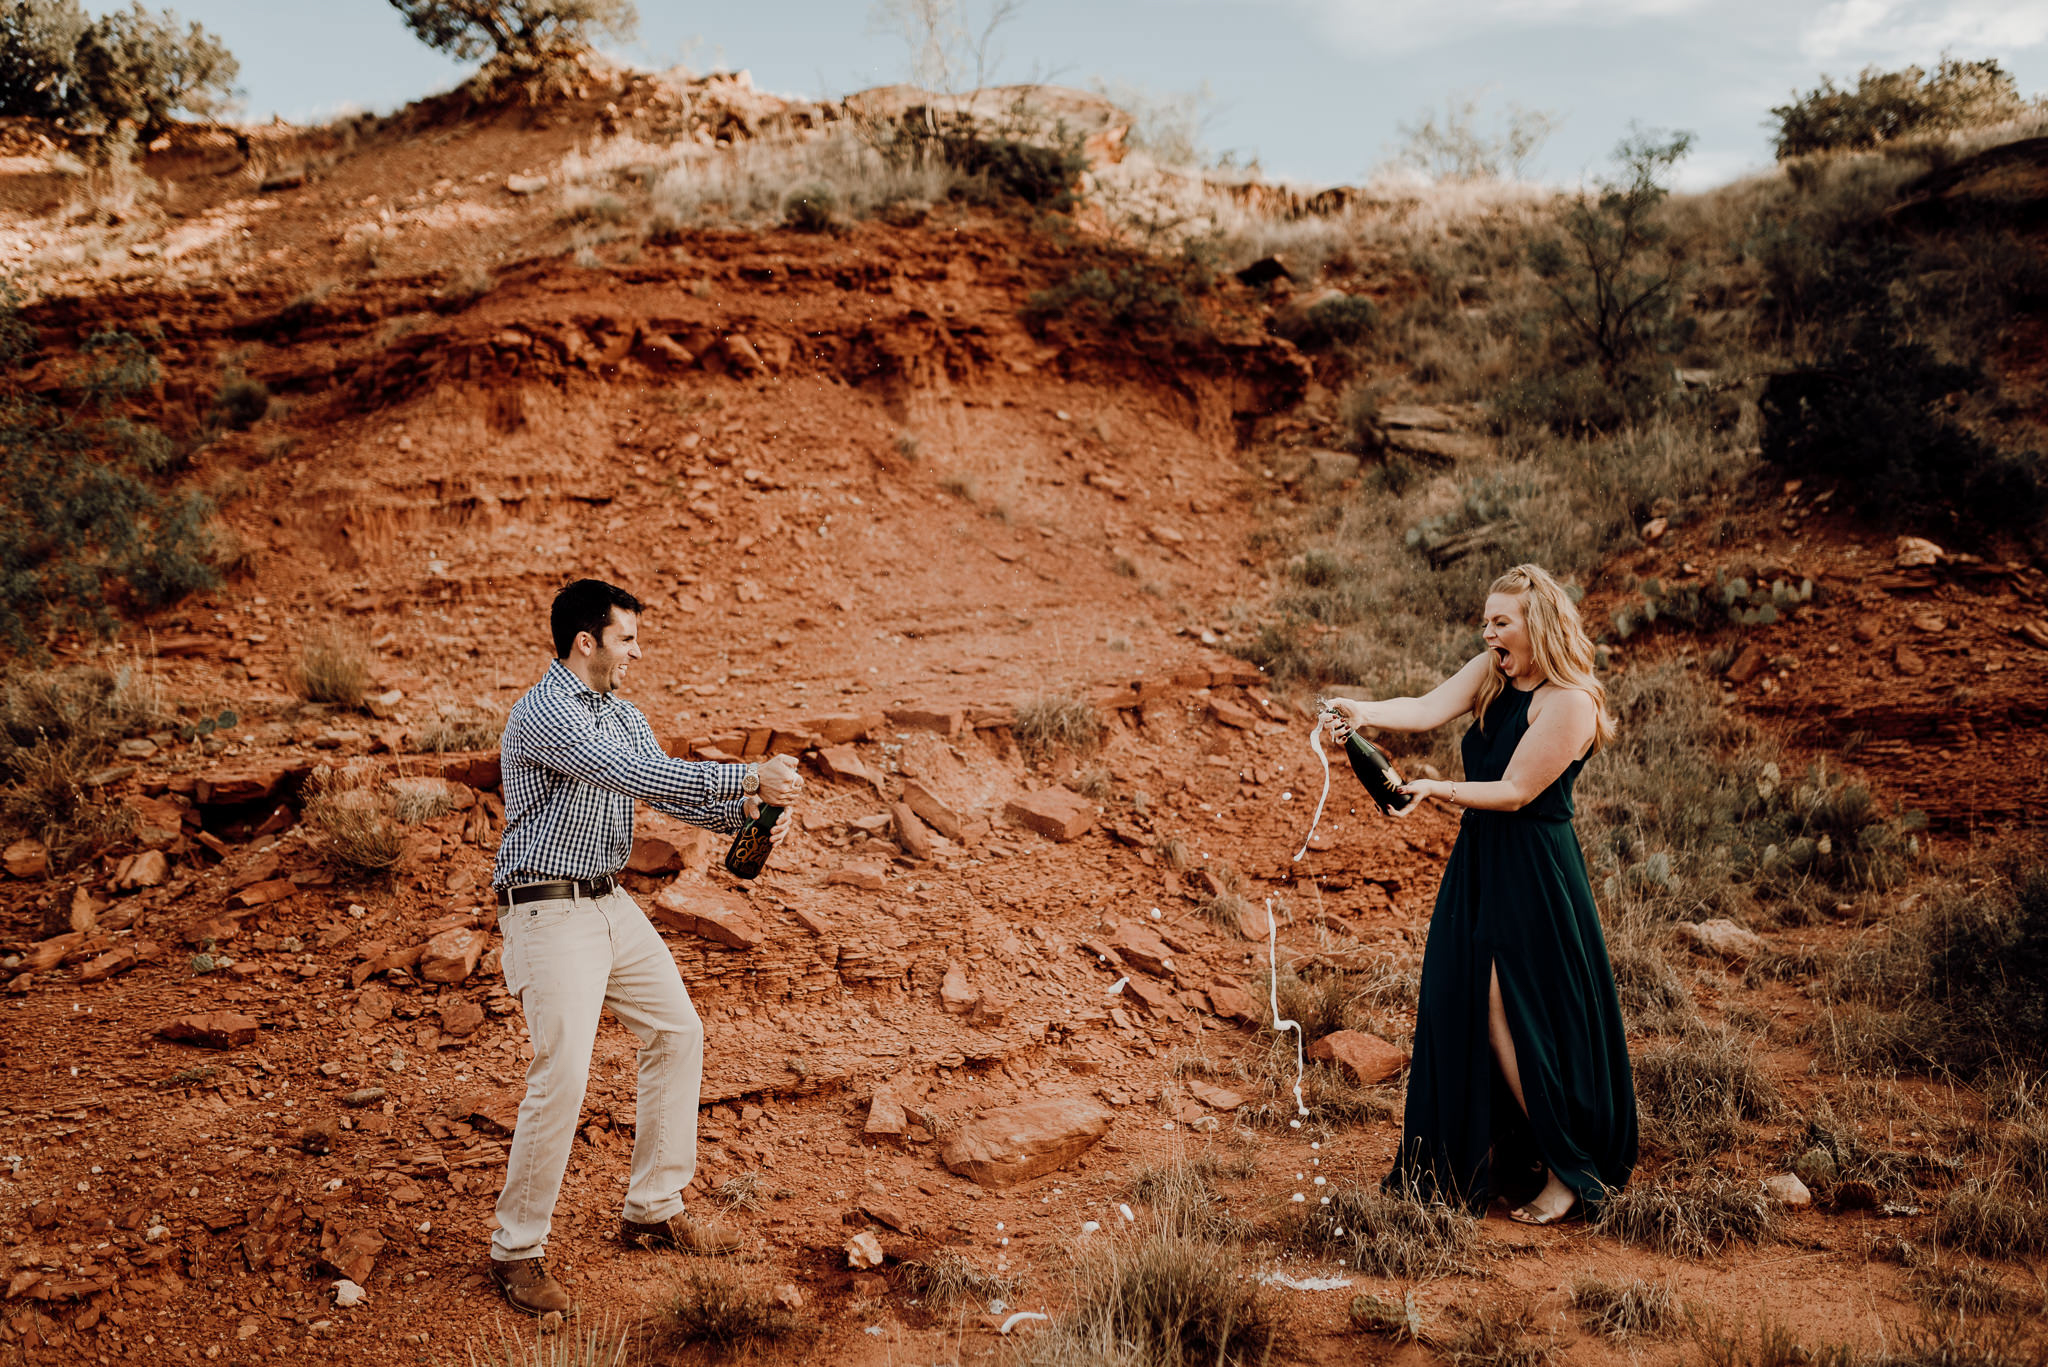 Houston Wedding Photographer-Palo Duro Canyon Engagement Session- Houston Wedding Photographer -Kristen Giles Photography-25.jpg